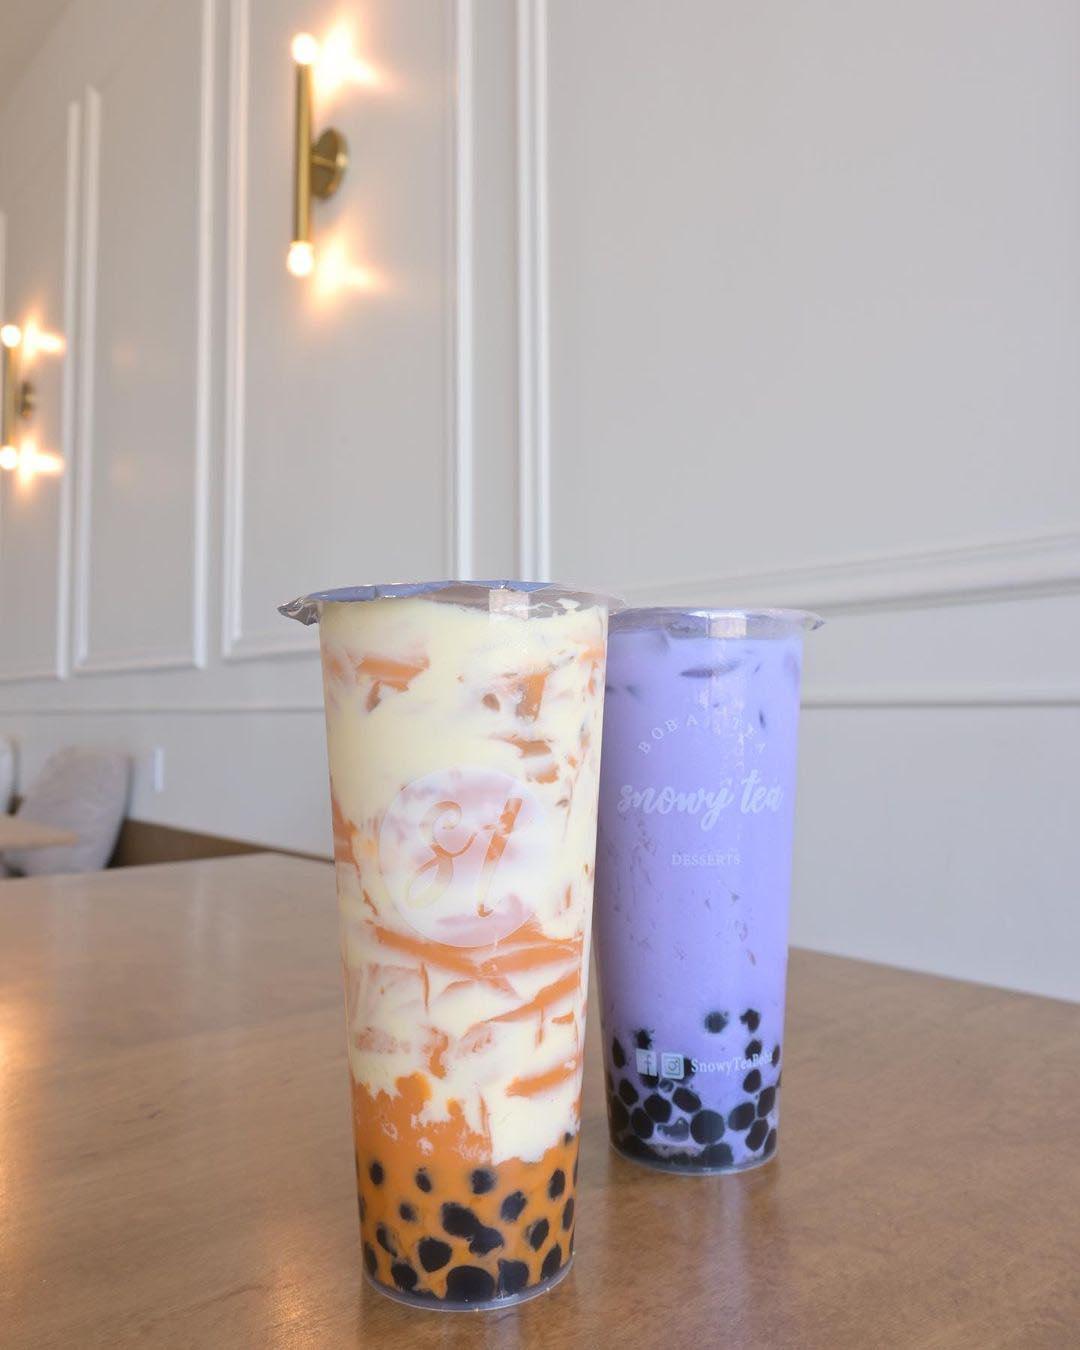 Snowy Tea Boba & Desserts 02